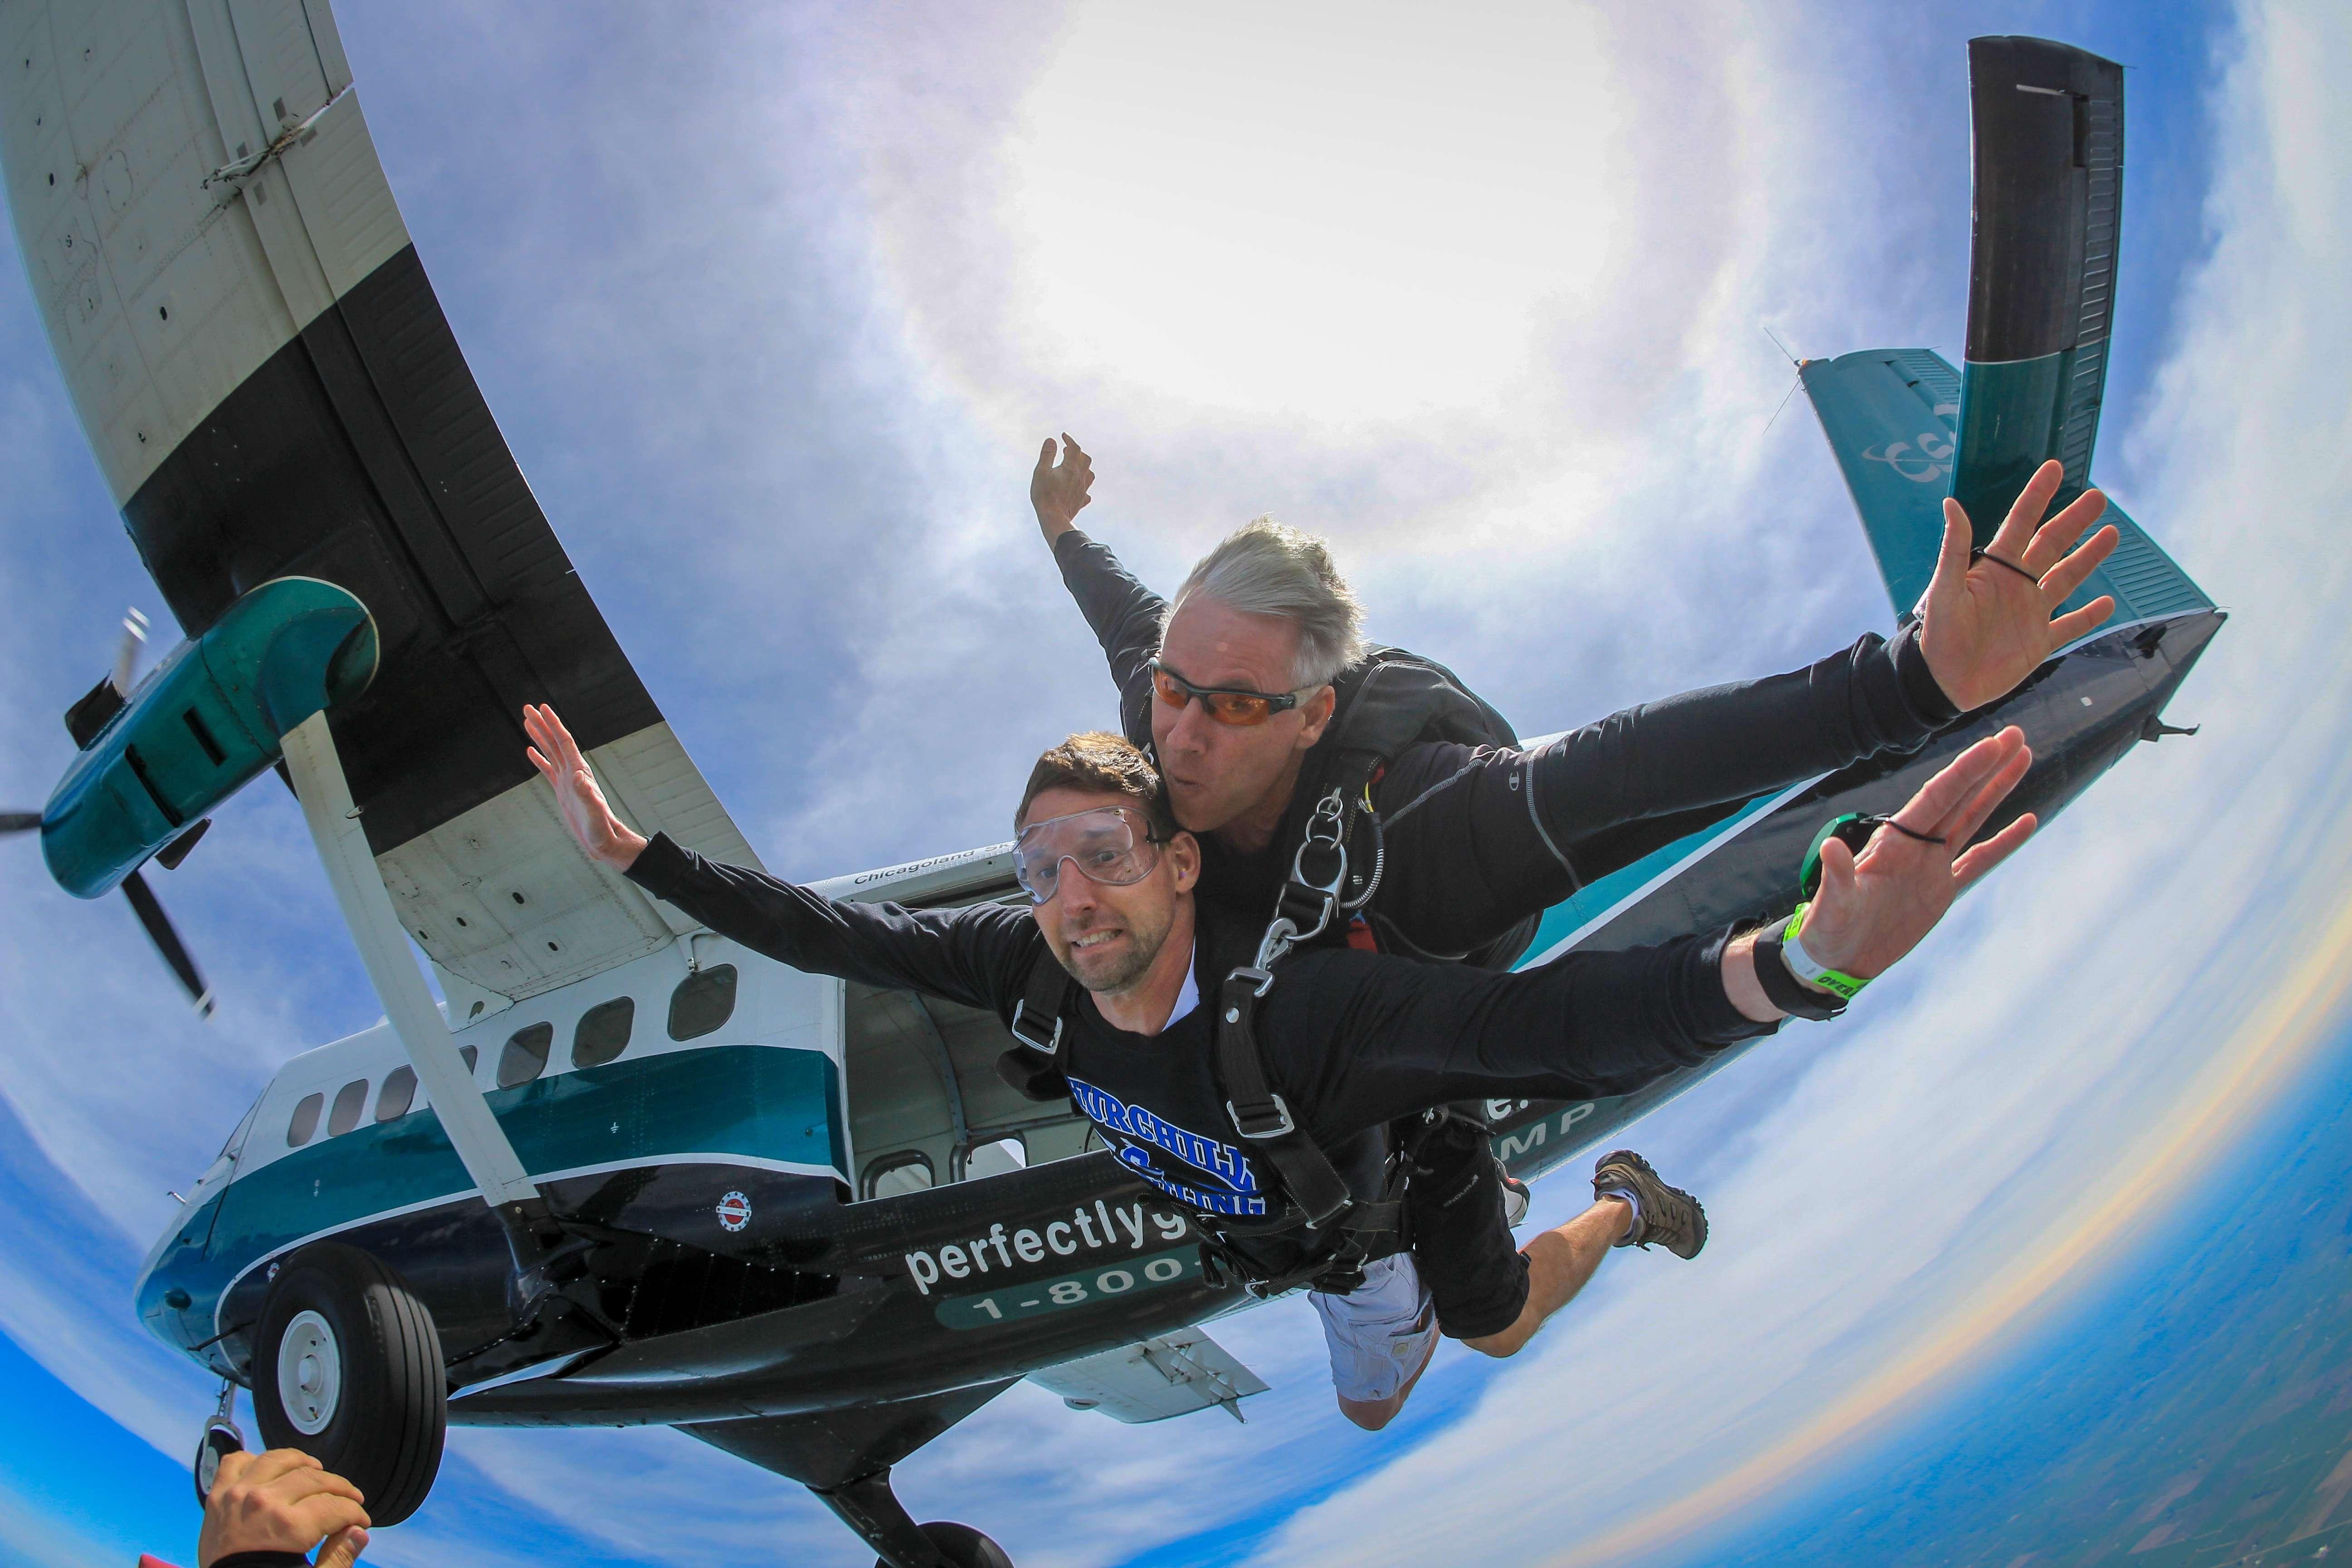 Tandem Skydiving: The Worst Marketing Gimmicks